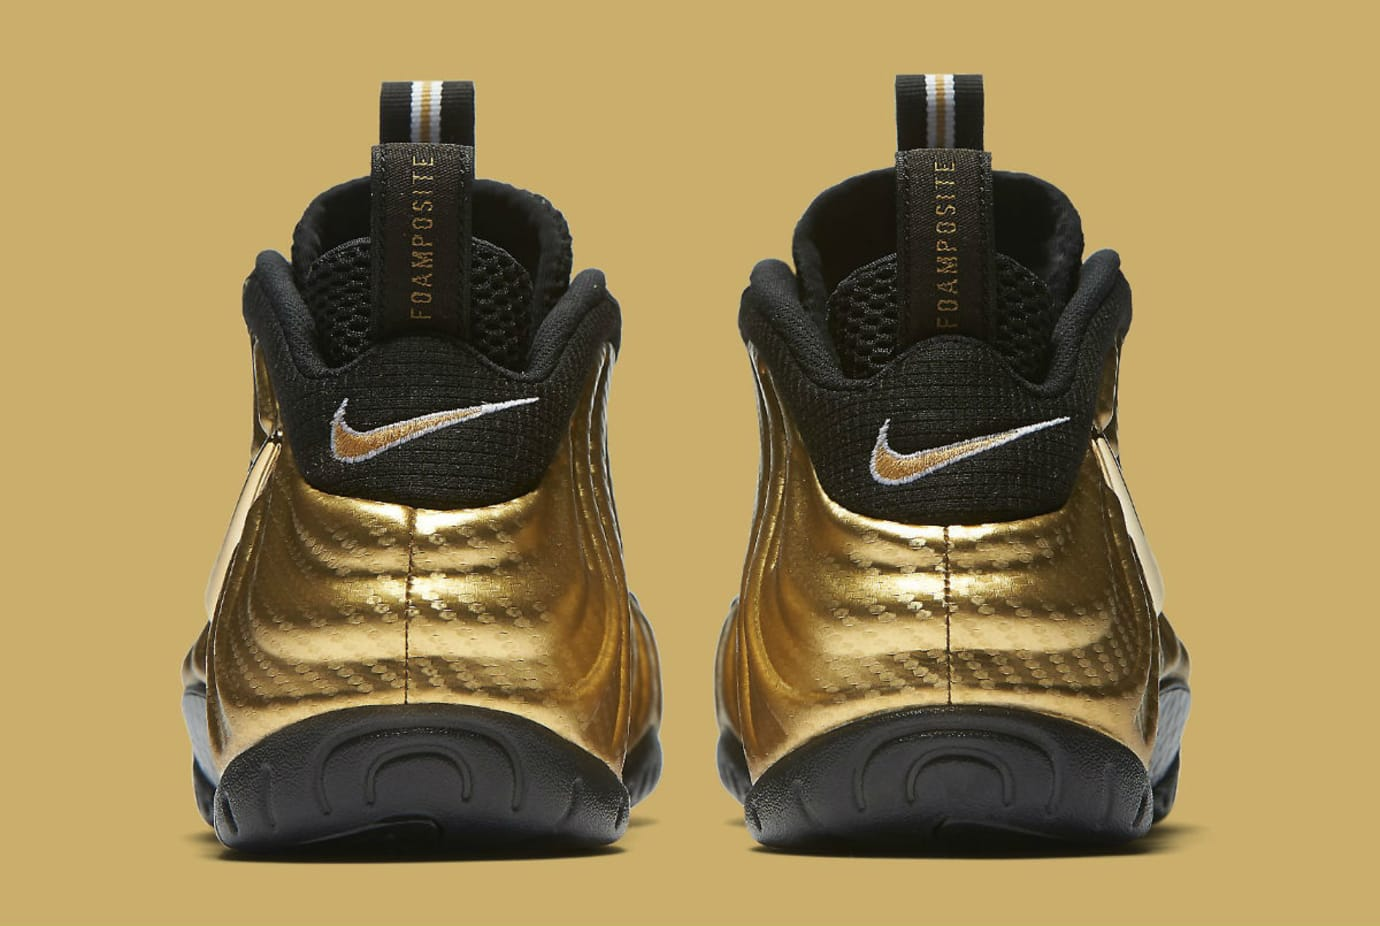 Nike Air Foamposite Pro Metallic Gold Release Date Heel 624041-701